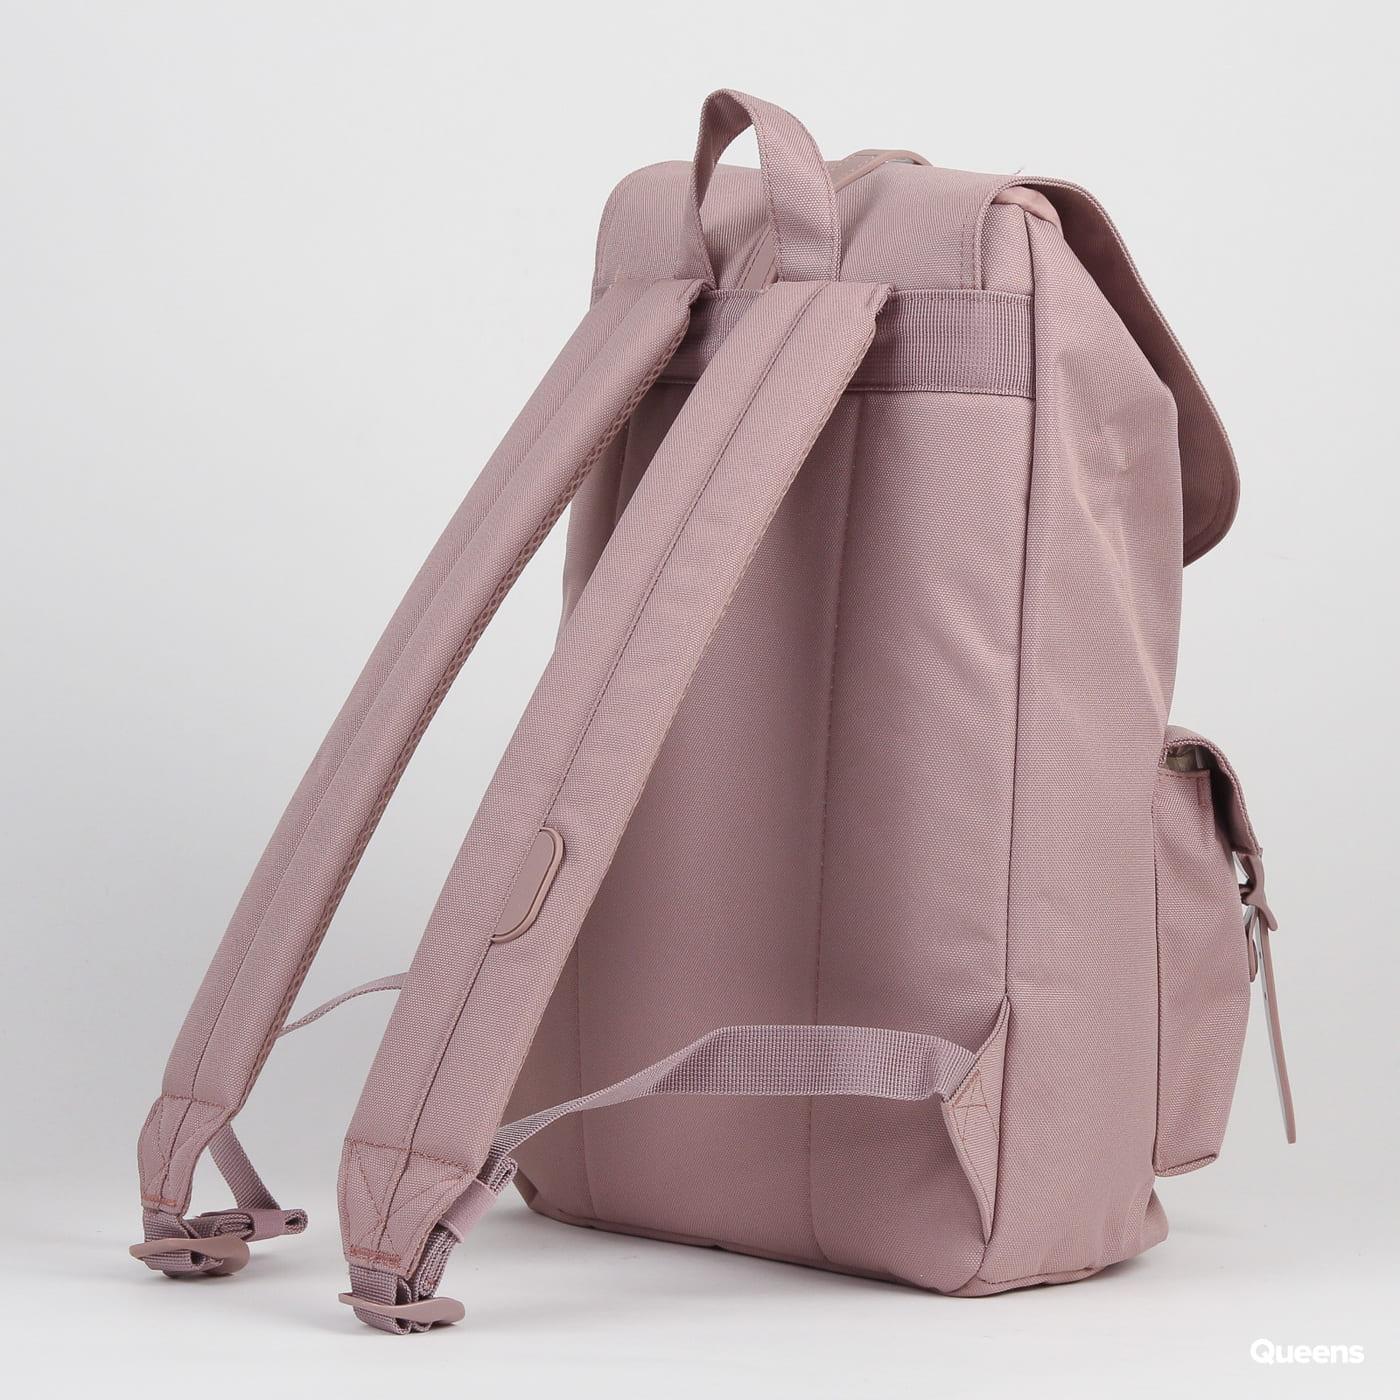 The Herschel Supply CO. Dawson Backpack svetlofialový